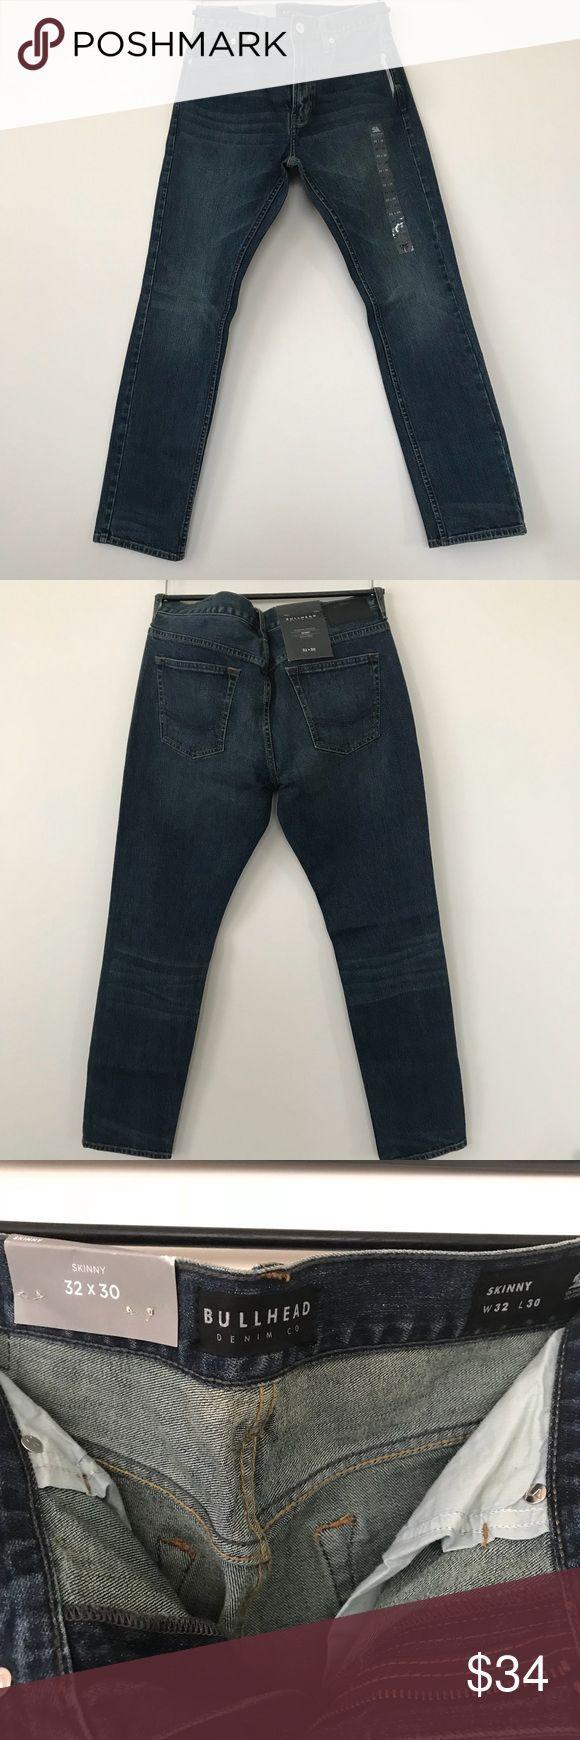 Nwt Pacsun Men's Skinny Jeans-32Wx30L by Bullhead Nwt Pacsun Men's Skinny Denim -32Wx30L by Bullhead Denim Co,Midnight Indigo,99% Cotton,1% Spandex PacSun Jeans Skinny